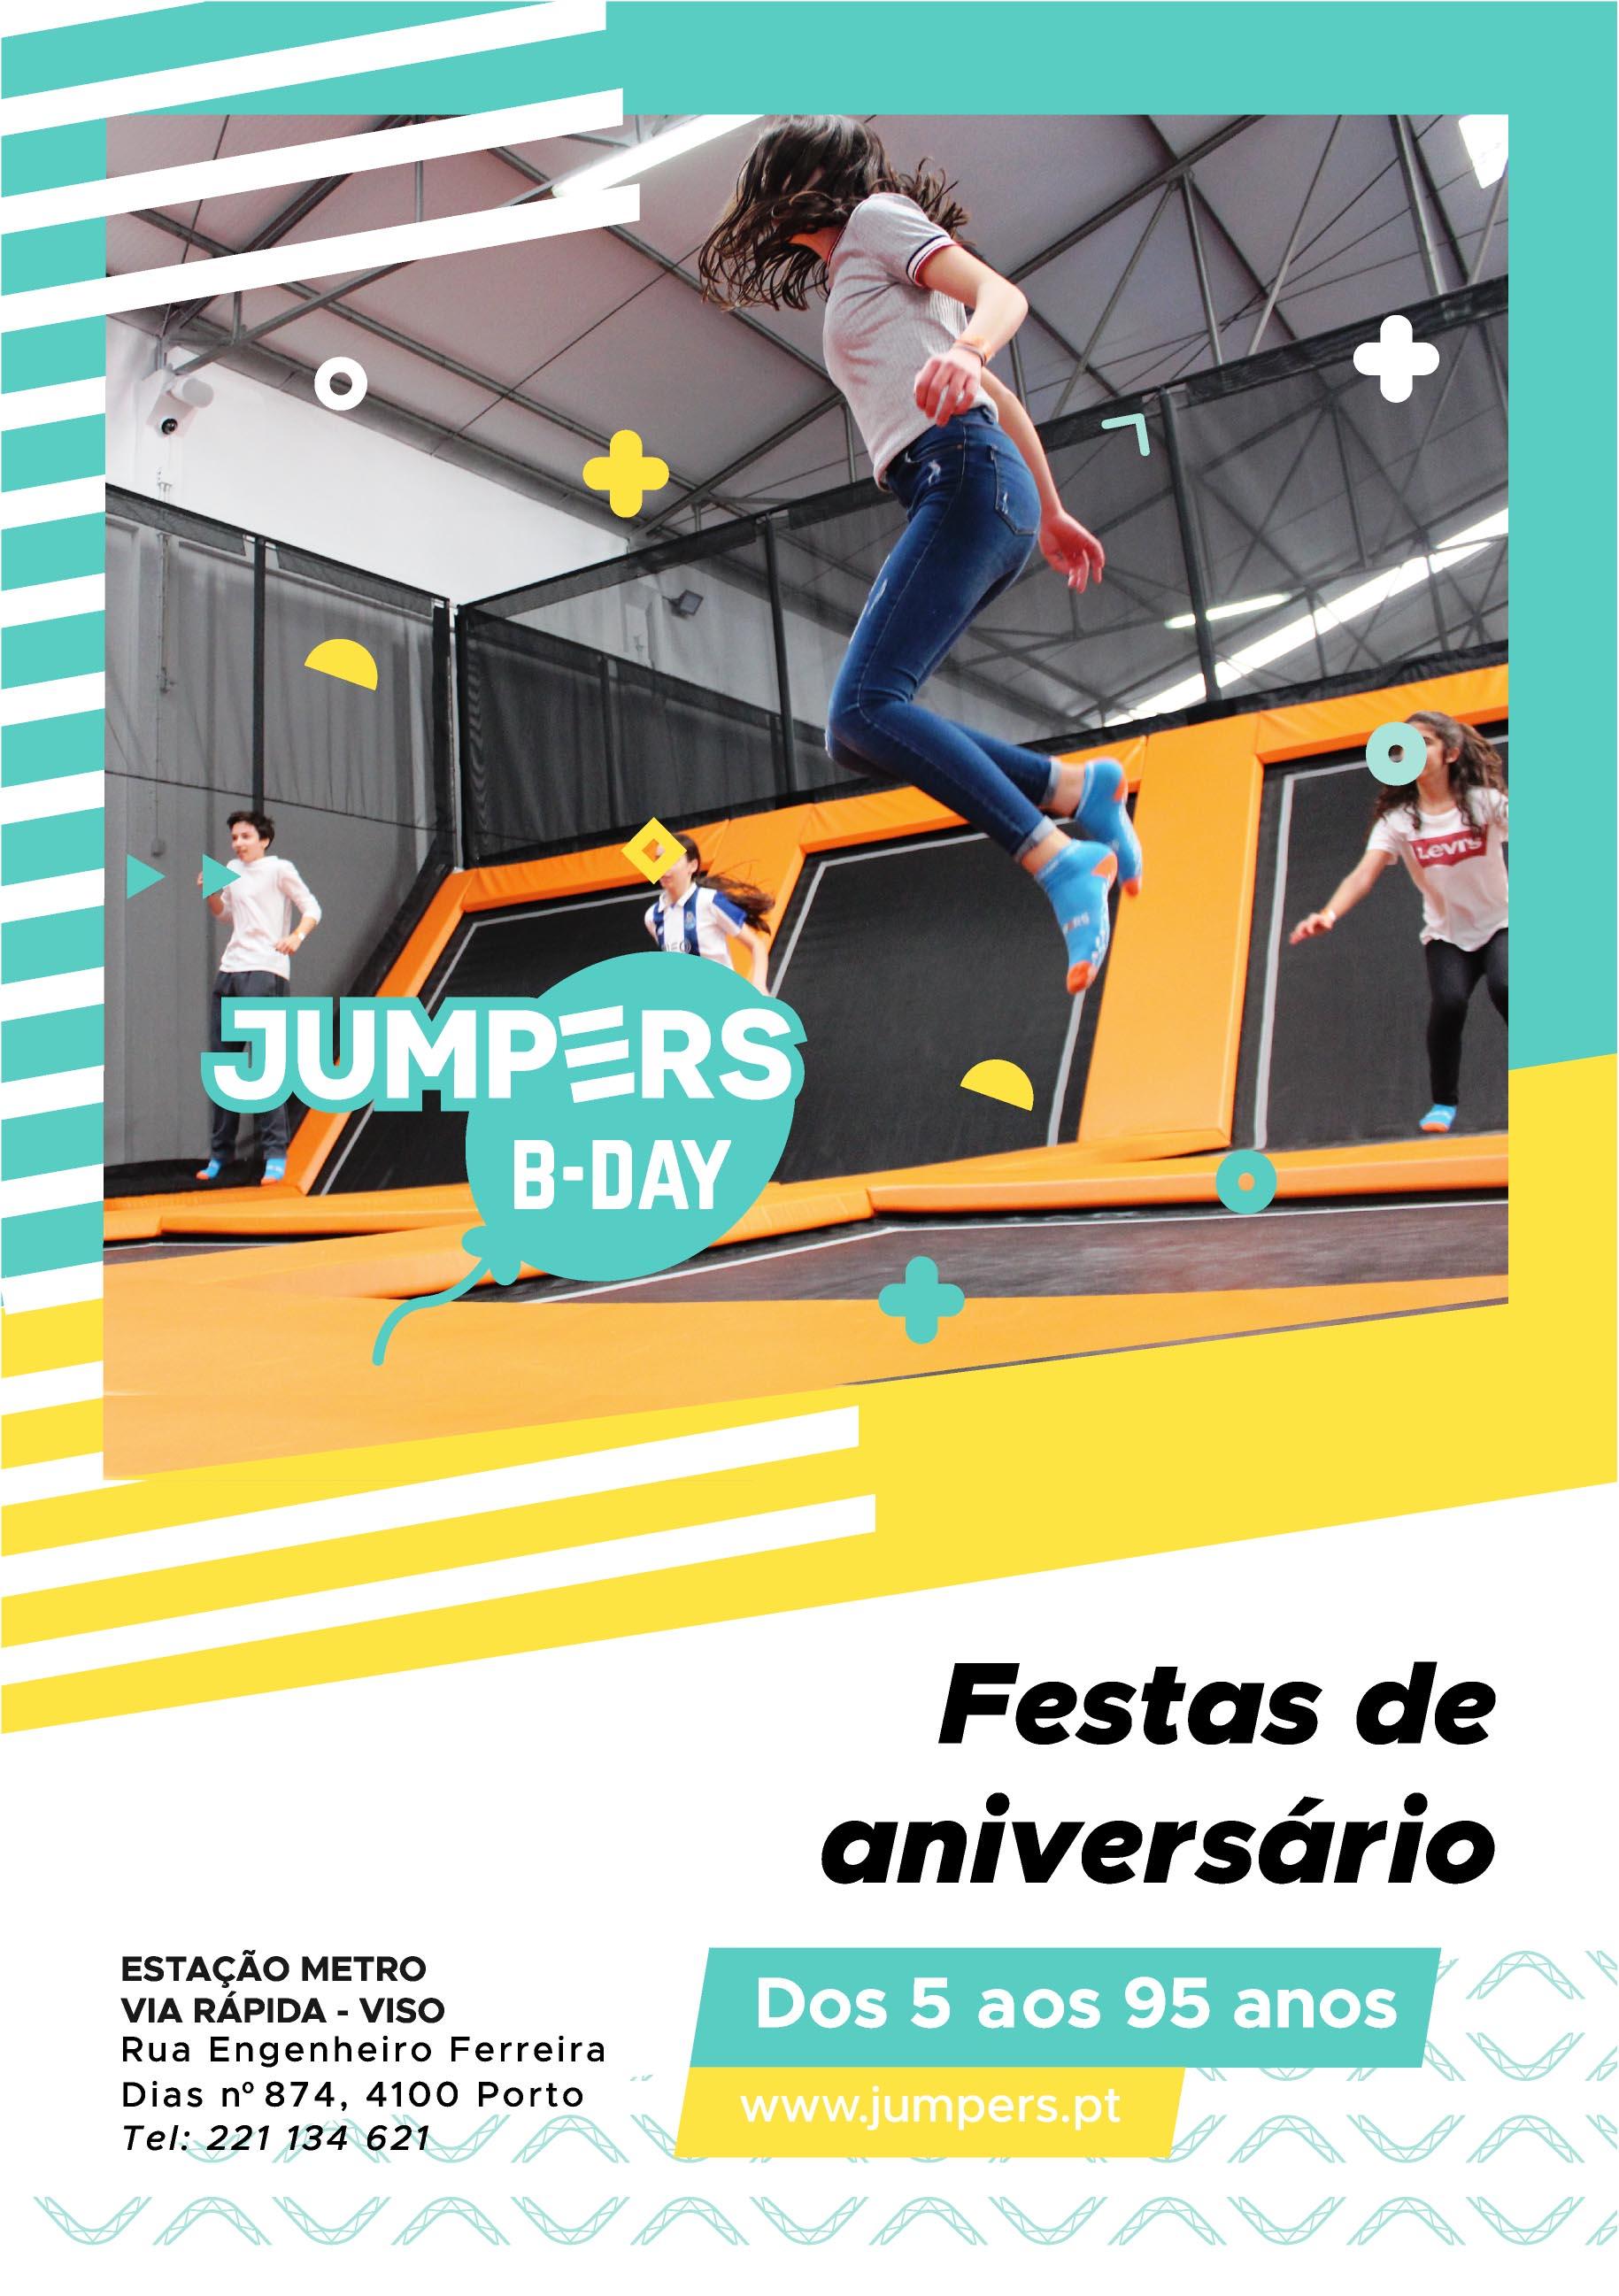 jumpers-aniversario-porto-trampolim.jpg